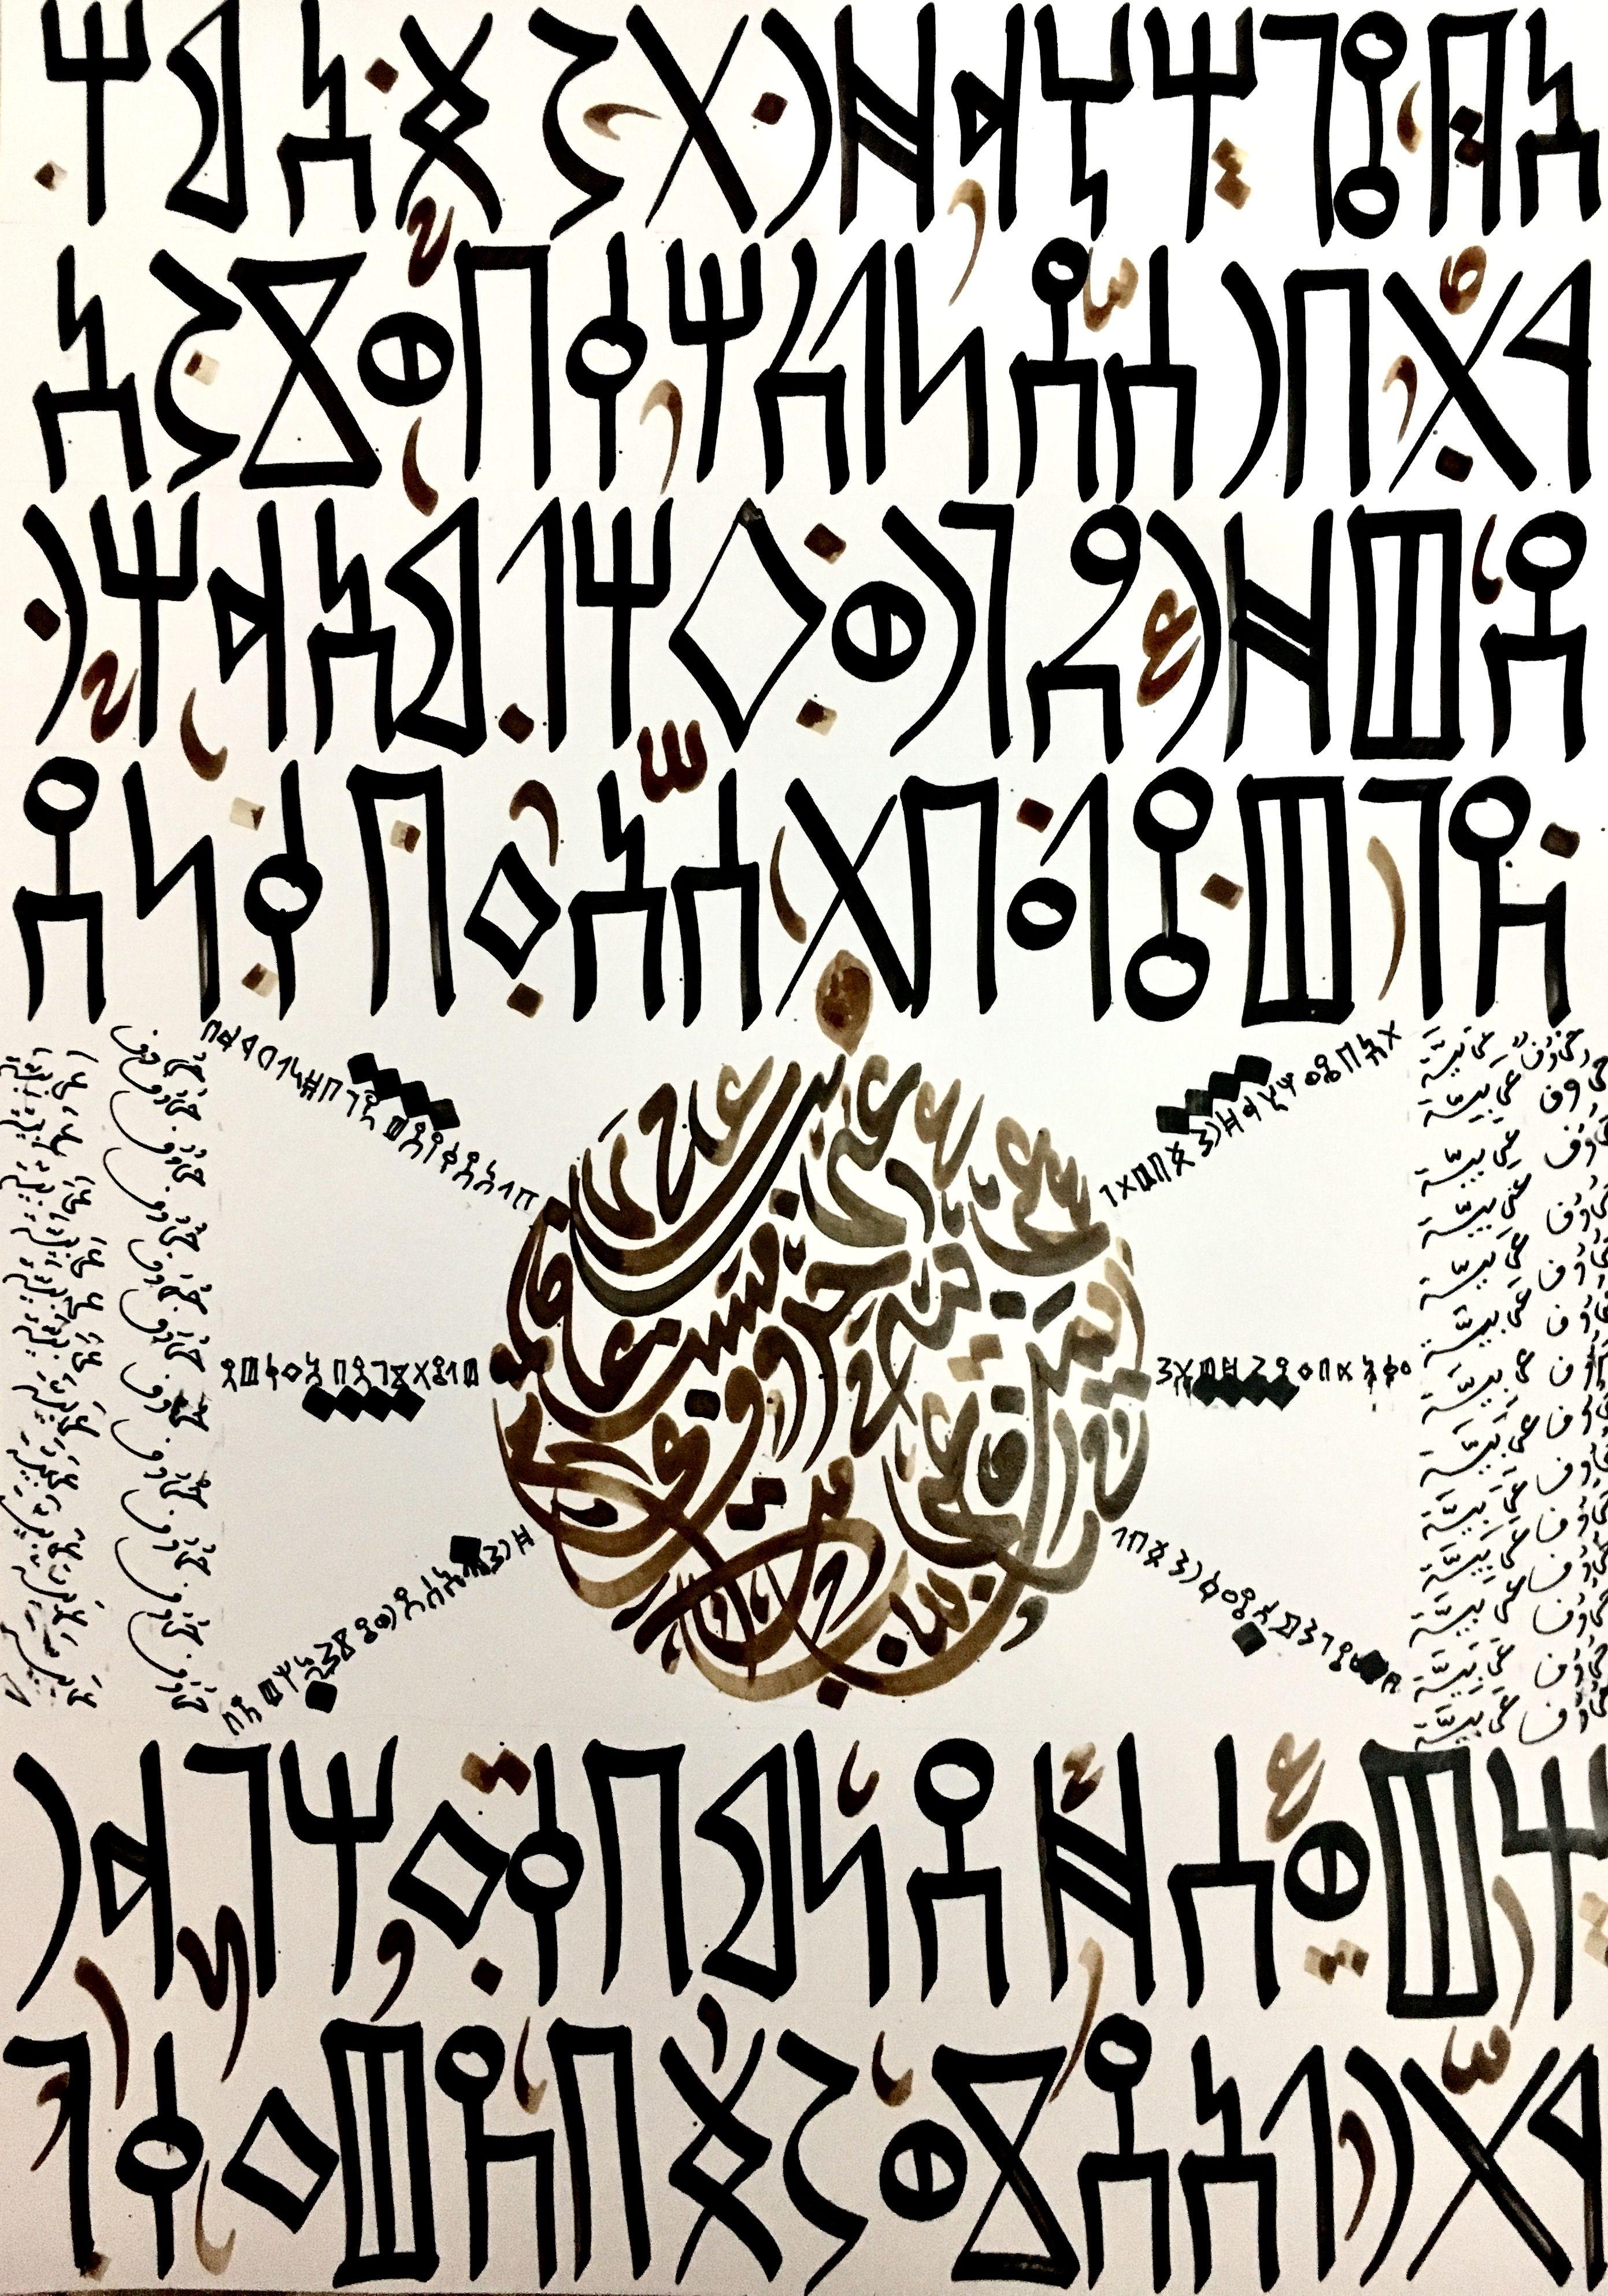 By Sami Gharbi Tunisia 30x42cm خط عربي يمني قديم خط المسند خط عربي مغربي خط كوفي قيرواني Ink On Paper Www Calligr Arabic Calligraphy Letters Calligraphy